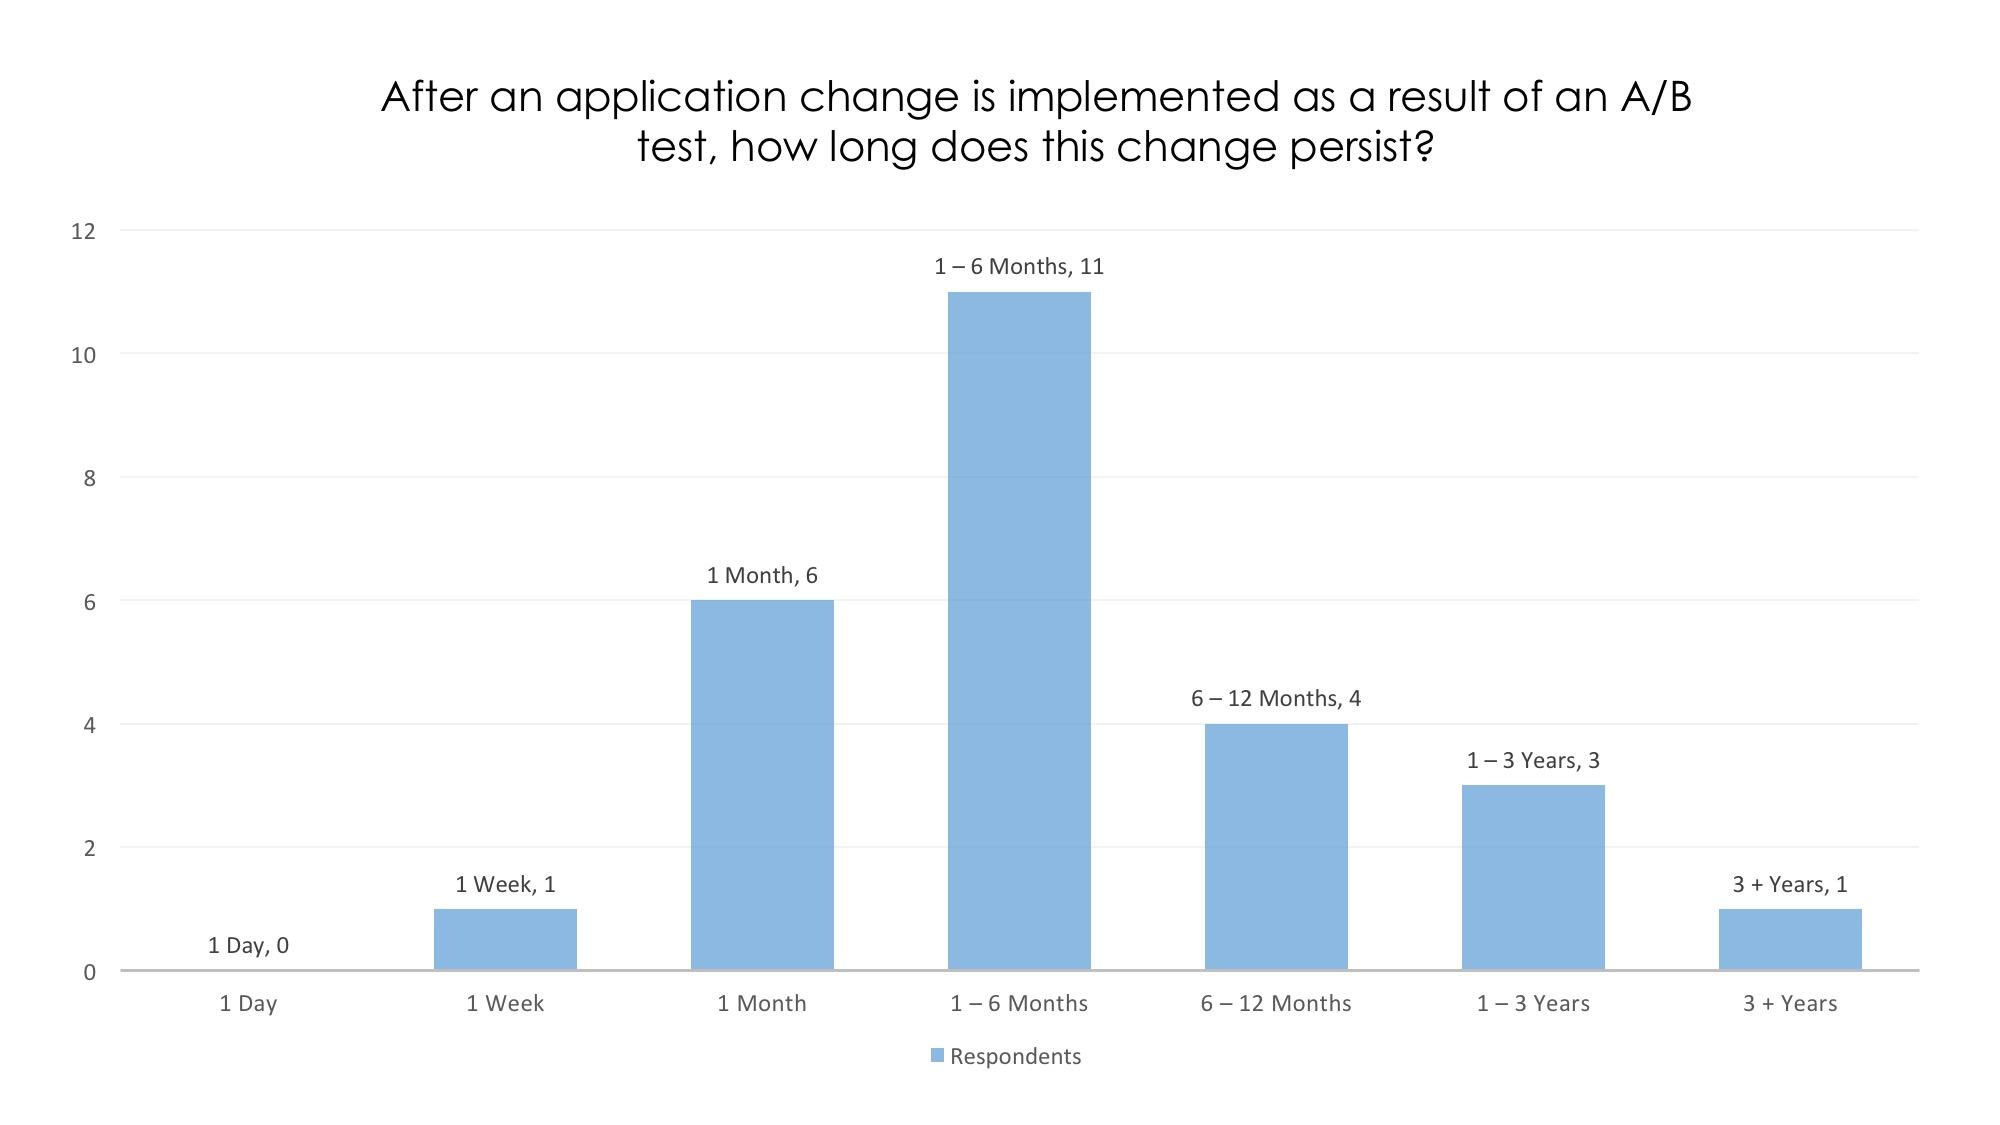 ab testing application change